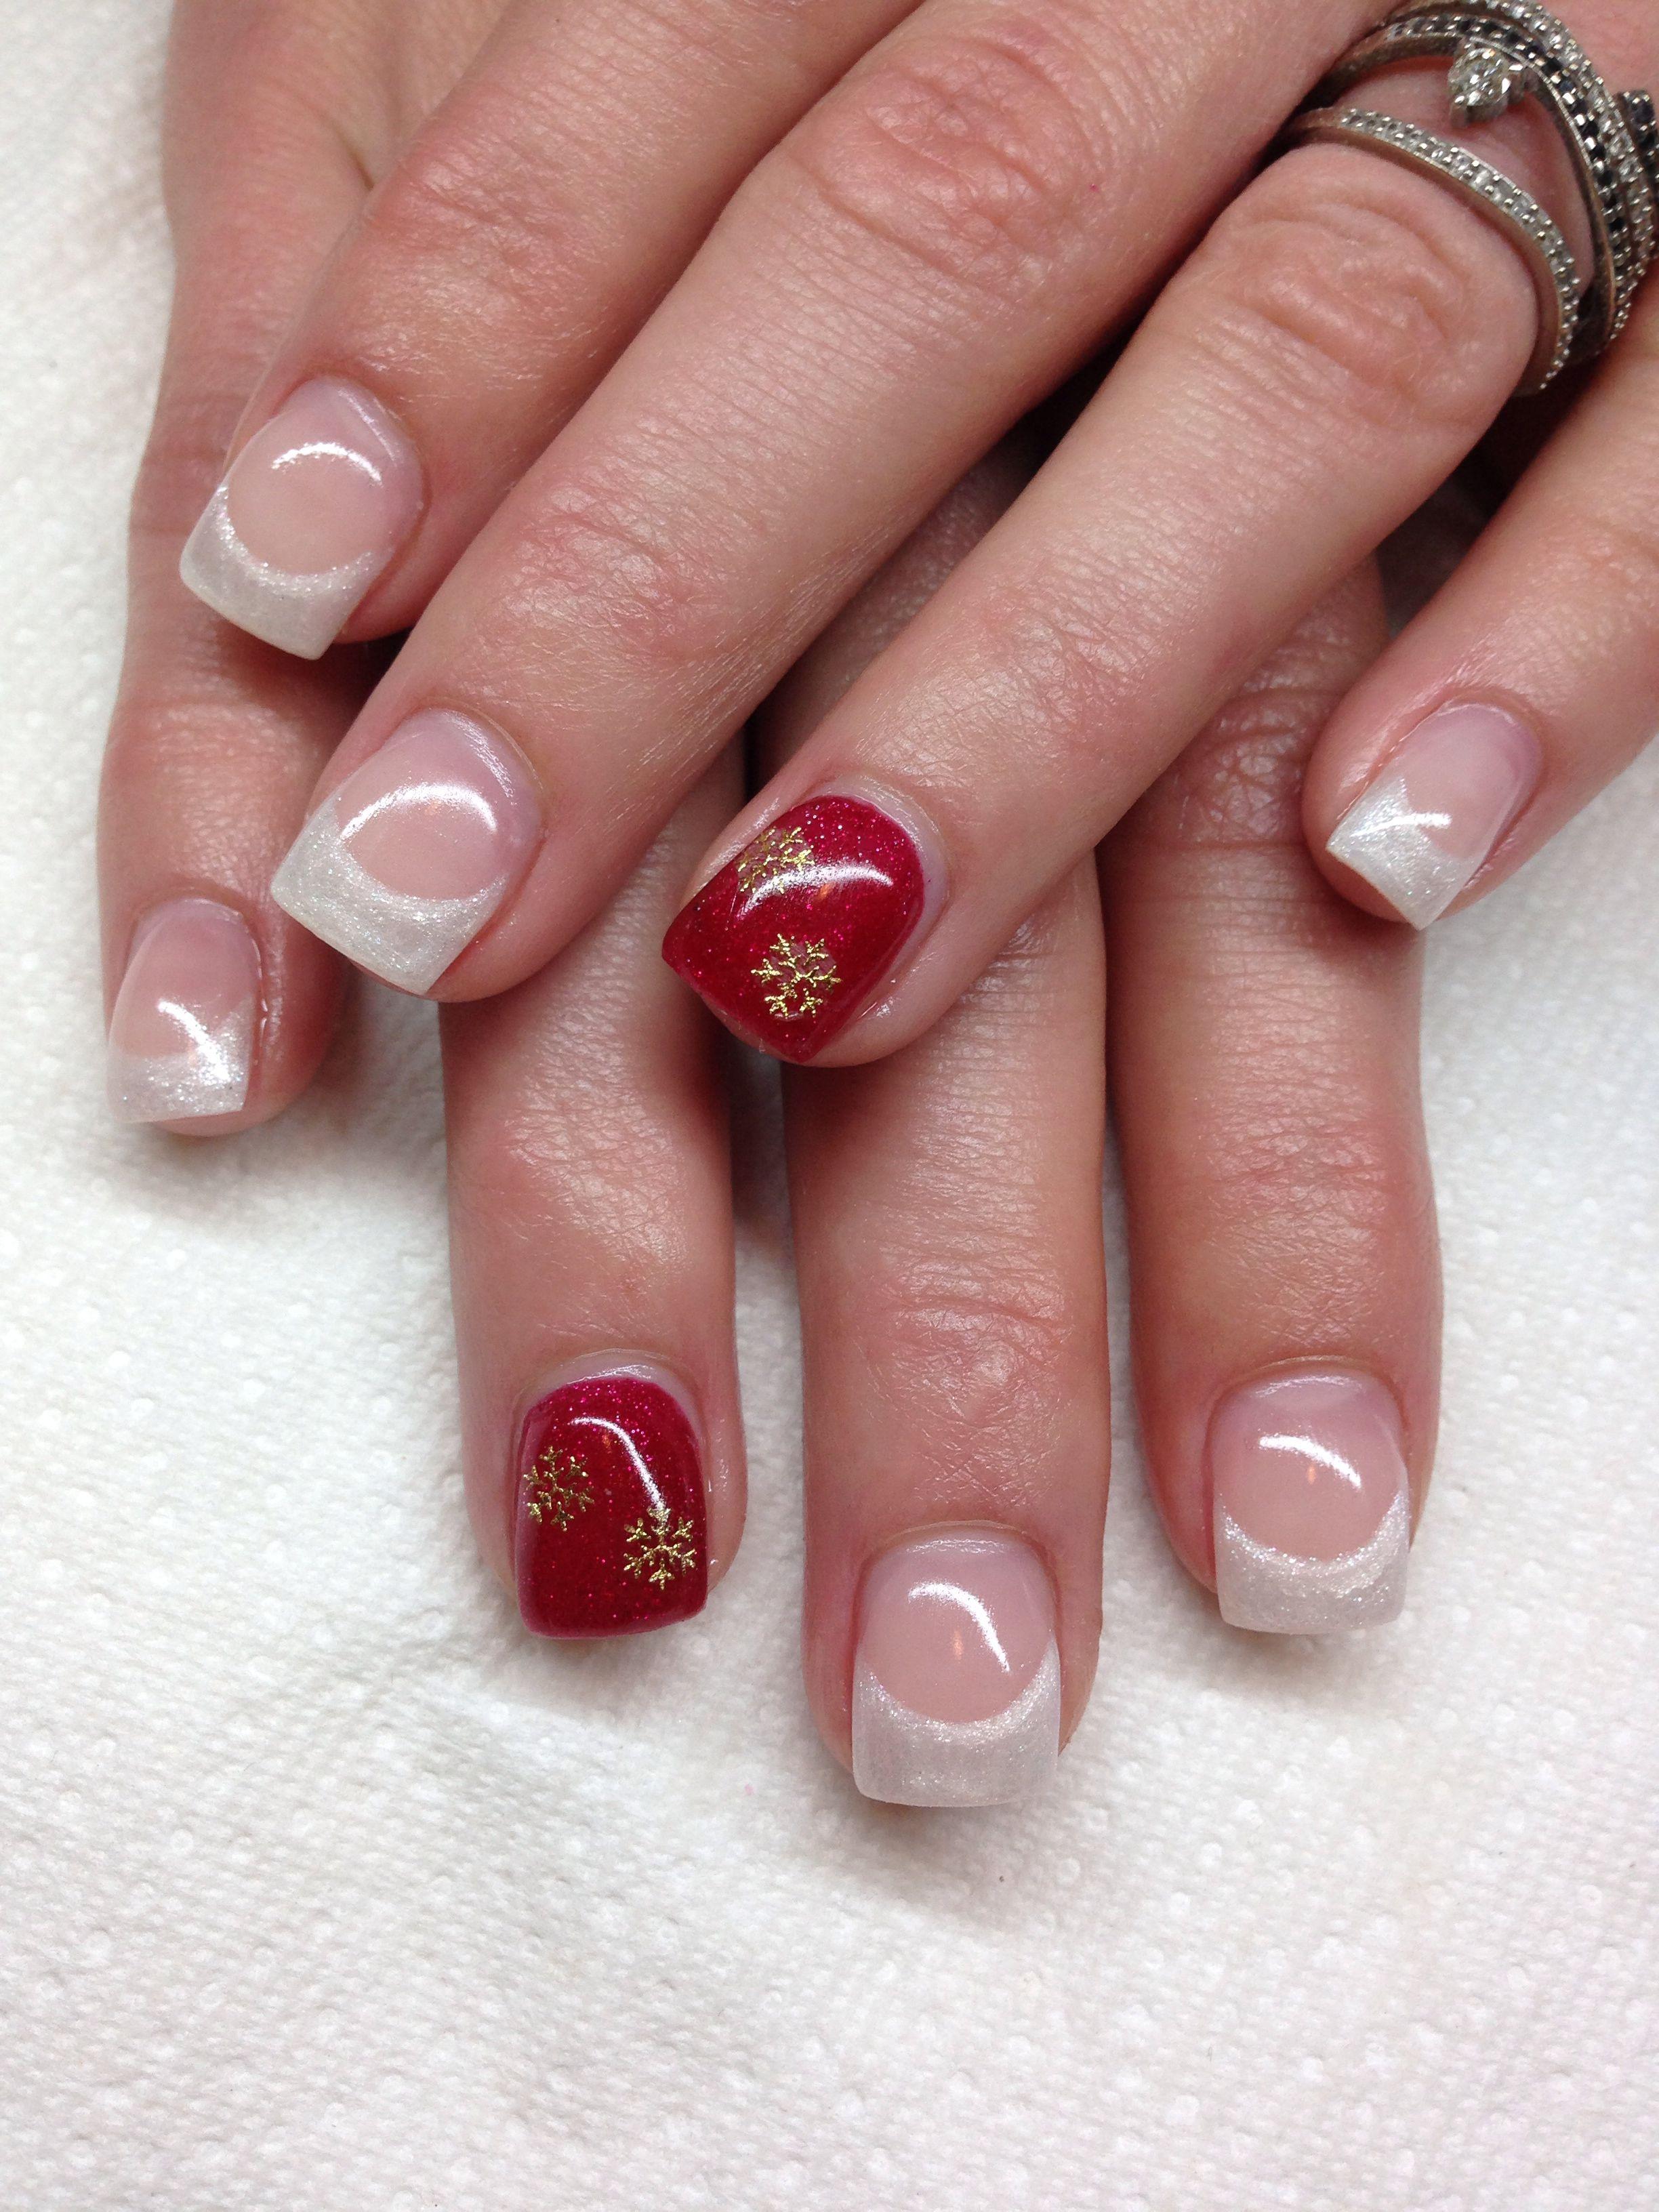 Gel nails By Melissa Fox Gel nails, Nails, Gel nails diy